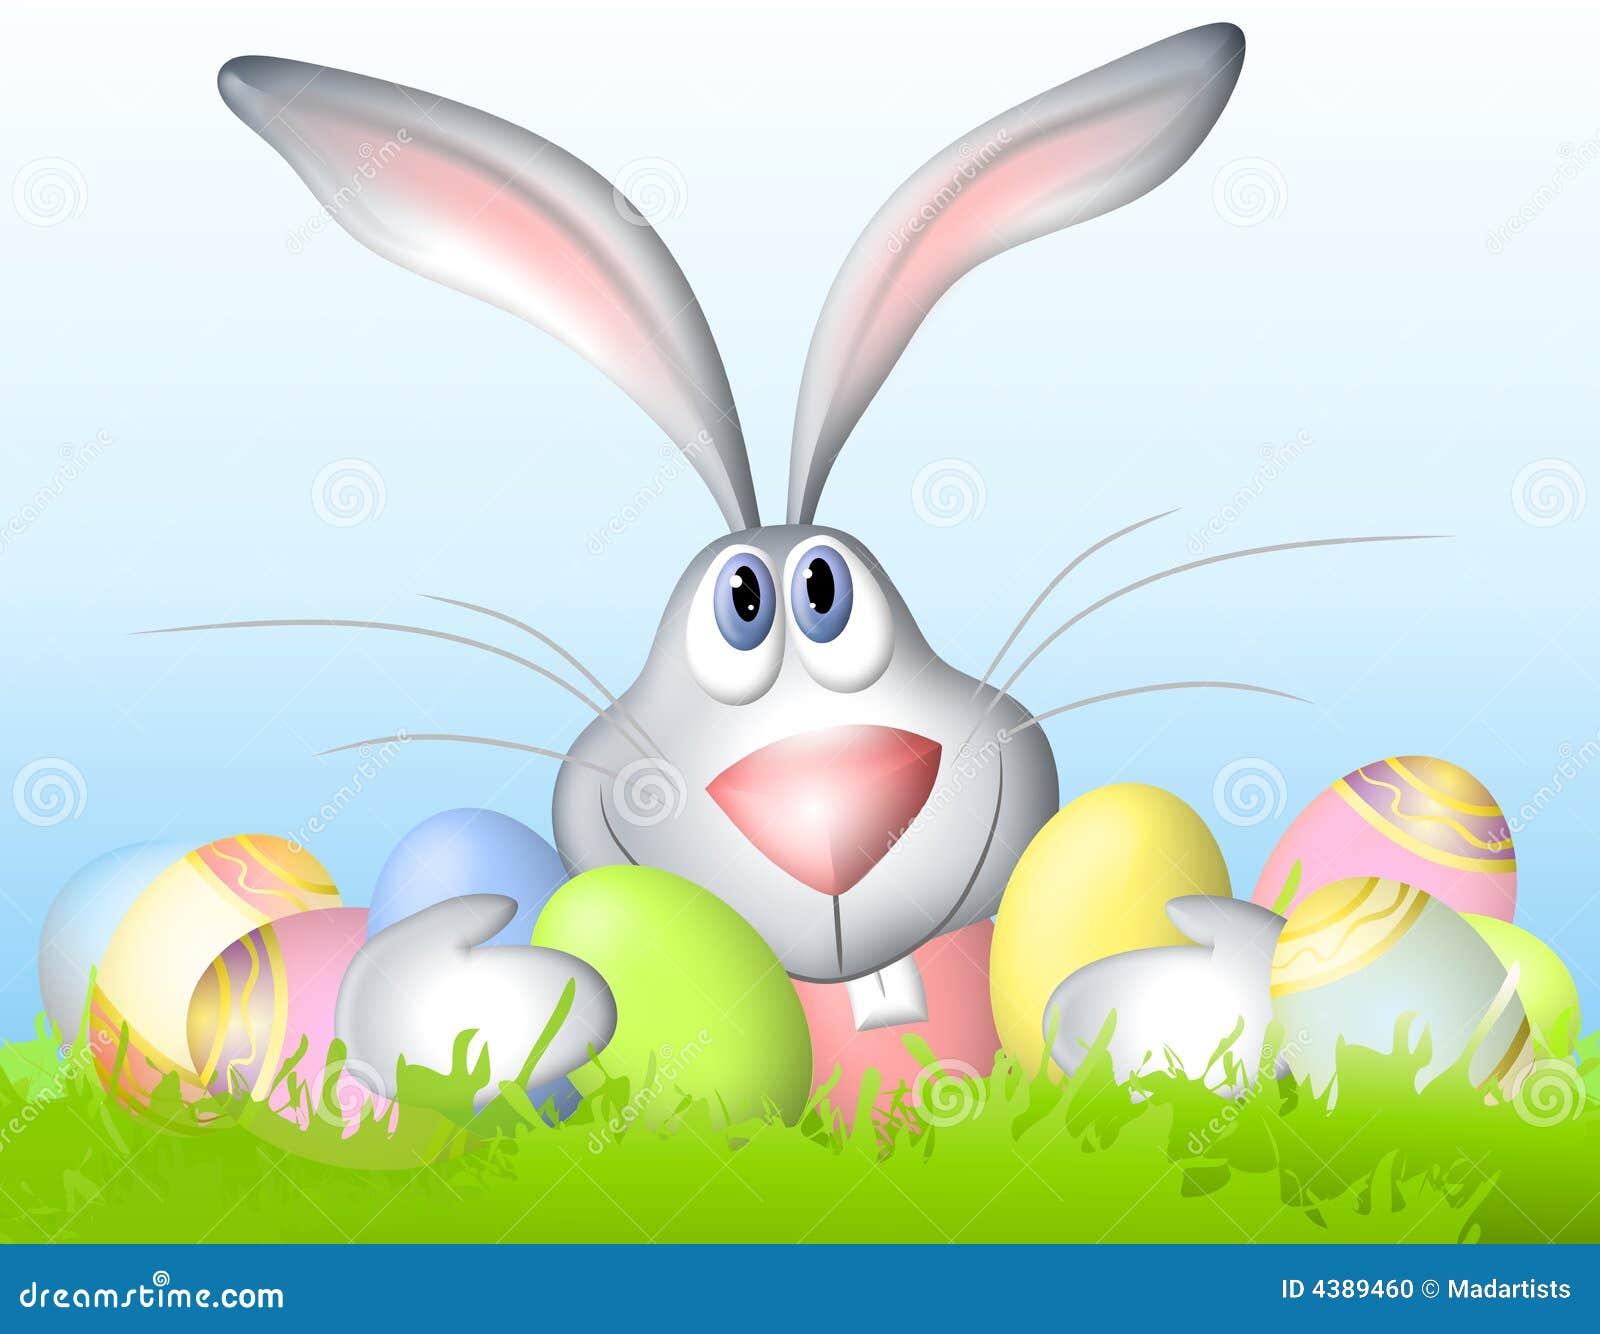 clip art illustration of a cartoonish looking Easter bunny sitting ...